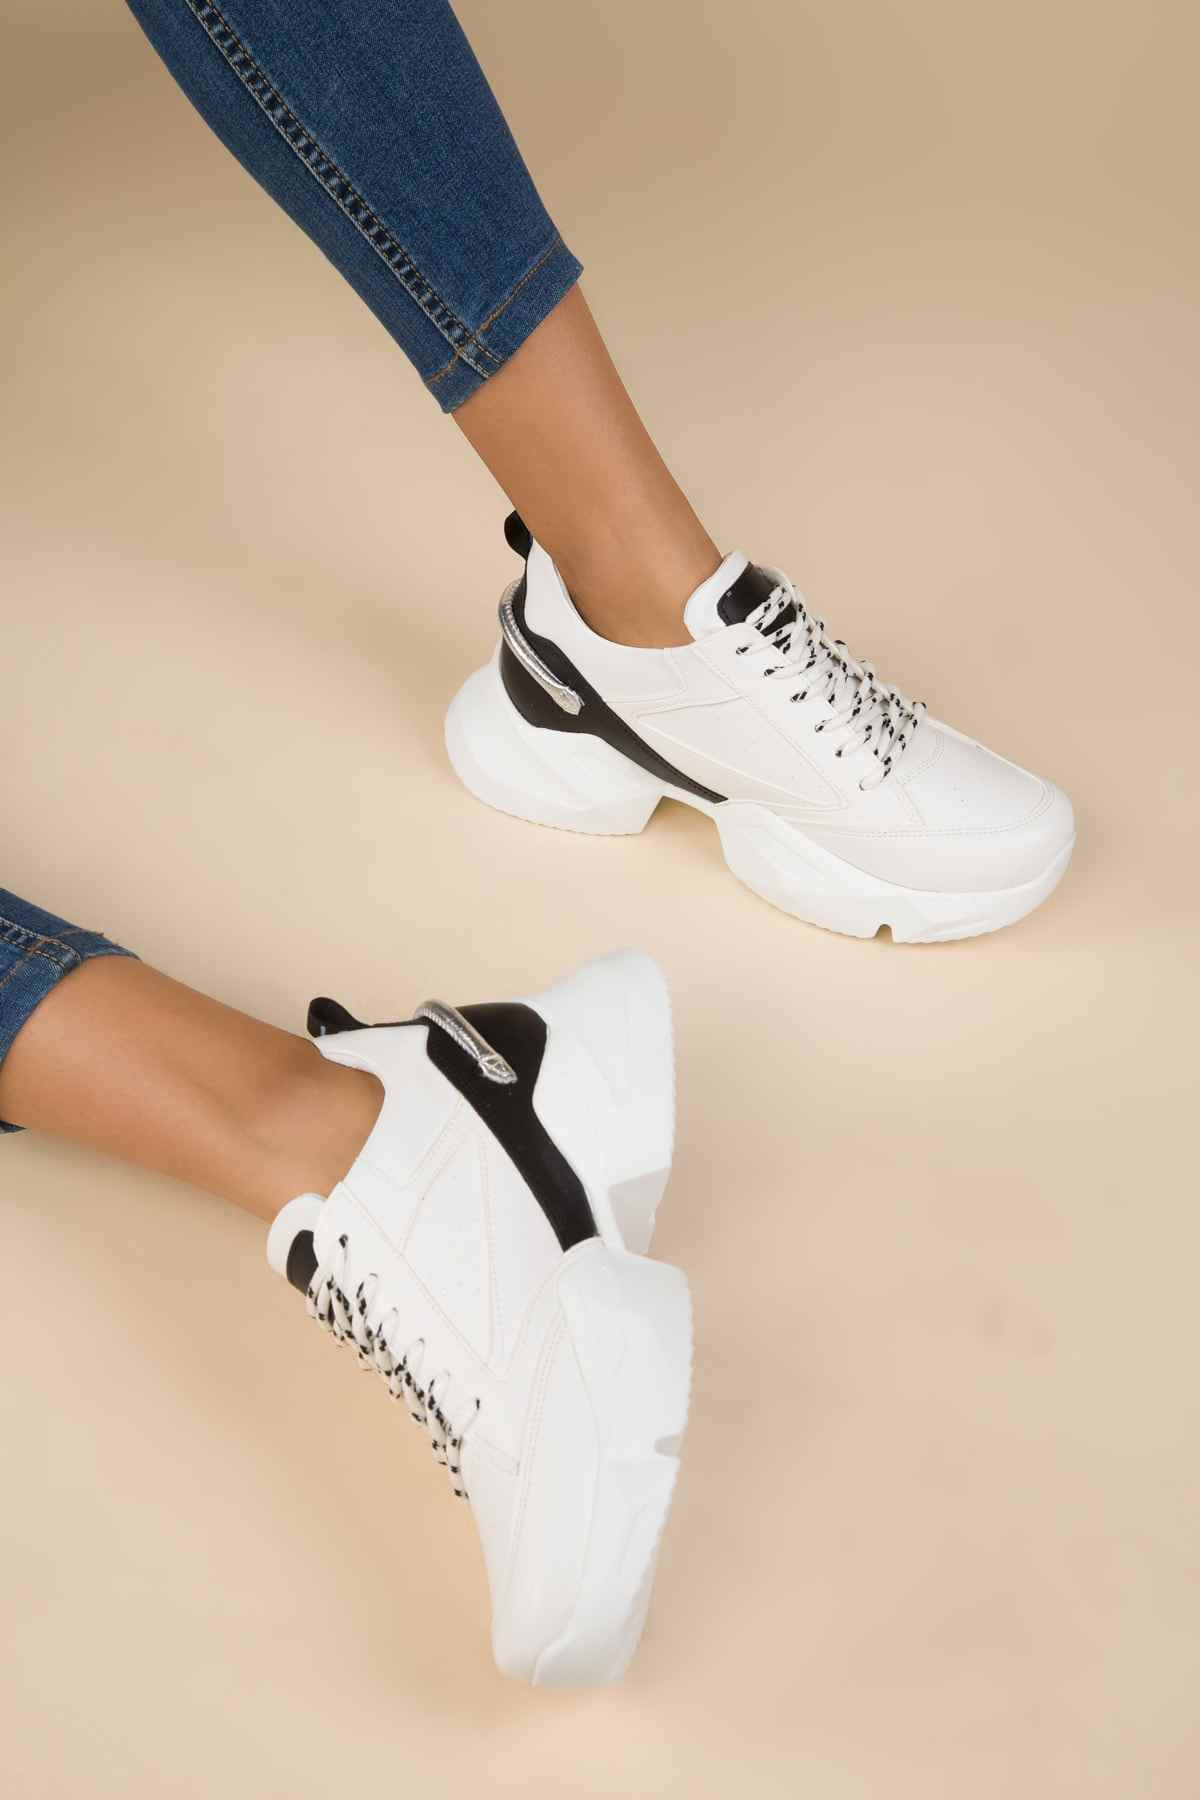 SOHO Frauen Mode Weiß Sneaker Damen Casual Lace-up Chubby Sport Schuhe Weibliche Bequeme Turnschuhe 13980